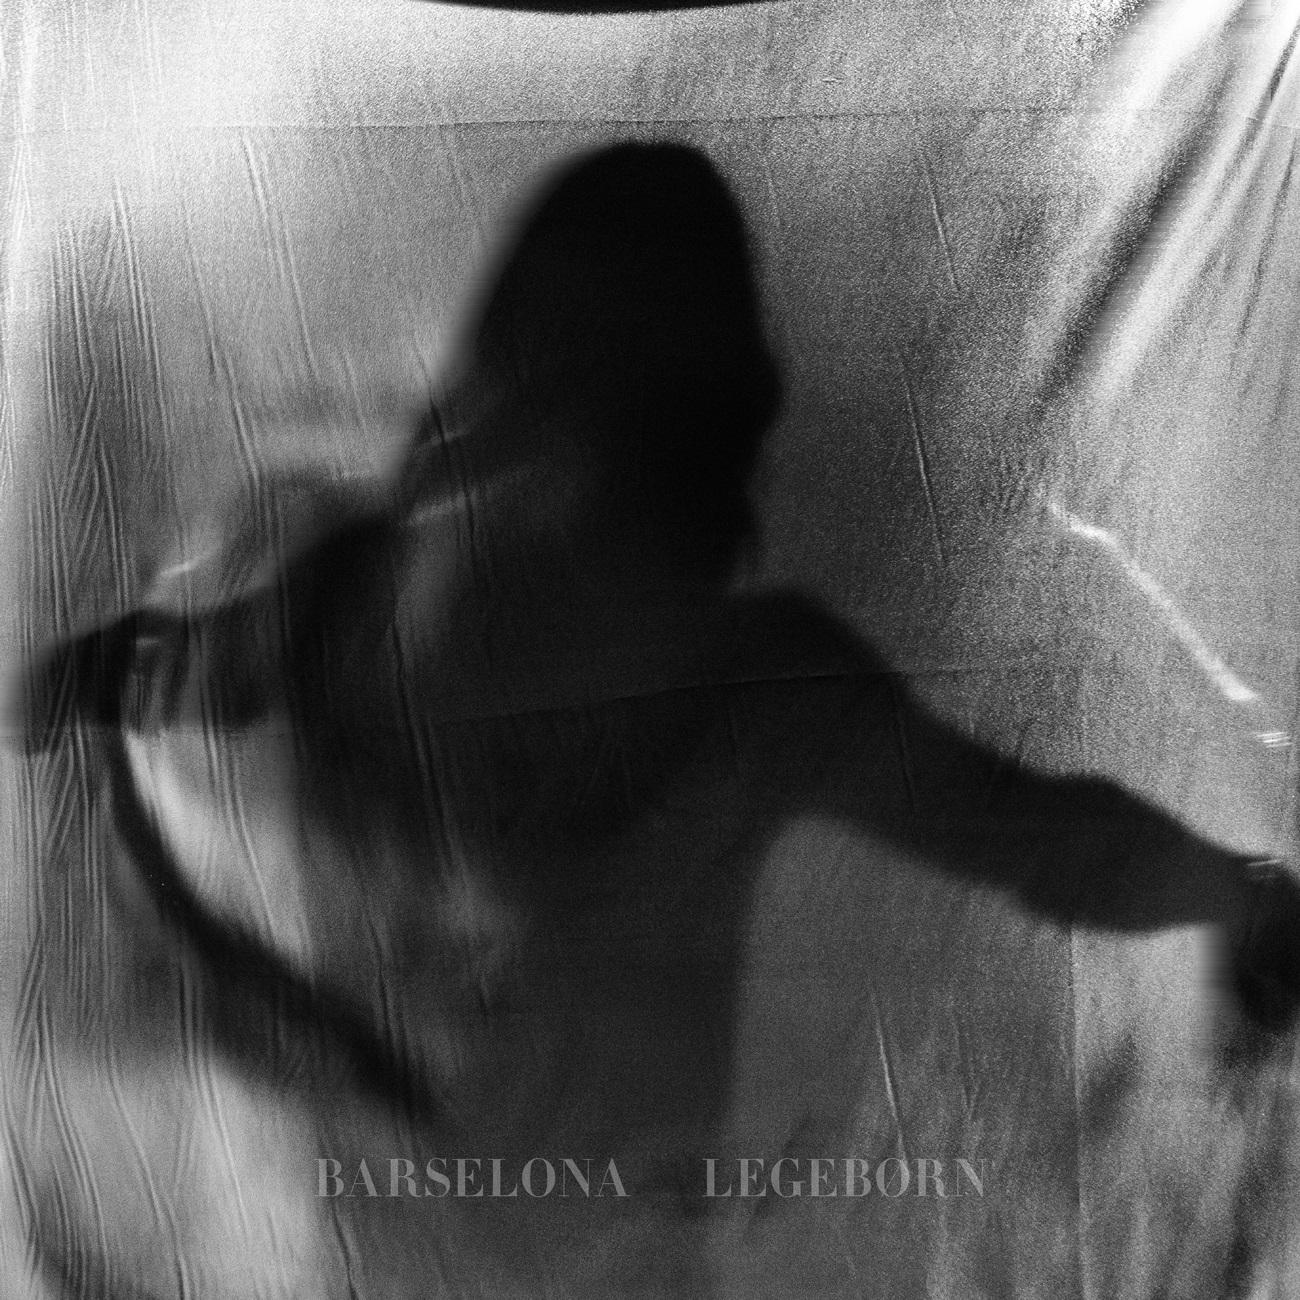 Legebørn - Barselona - Musik -  - 0602577511103 - 5/4-2019